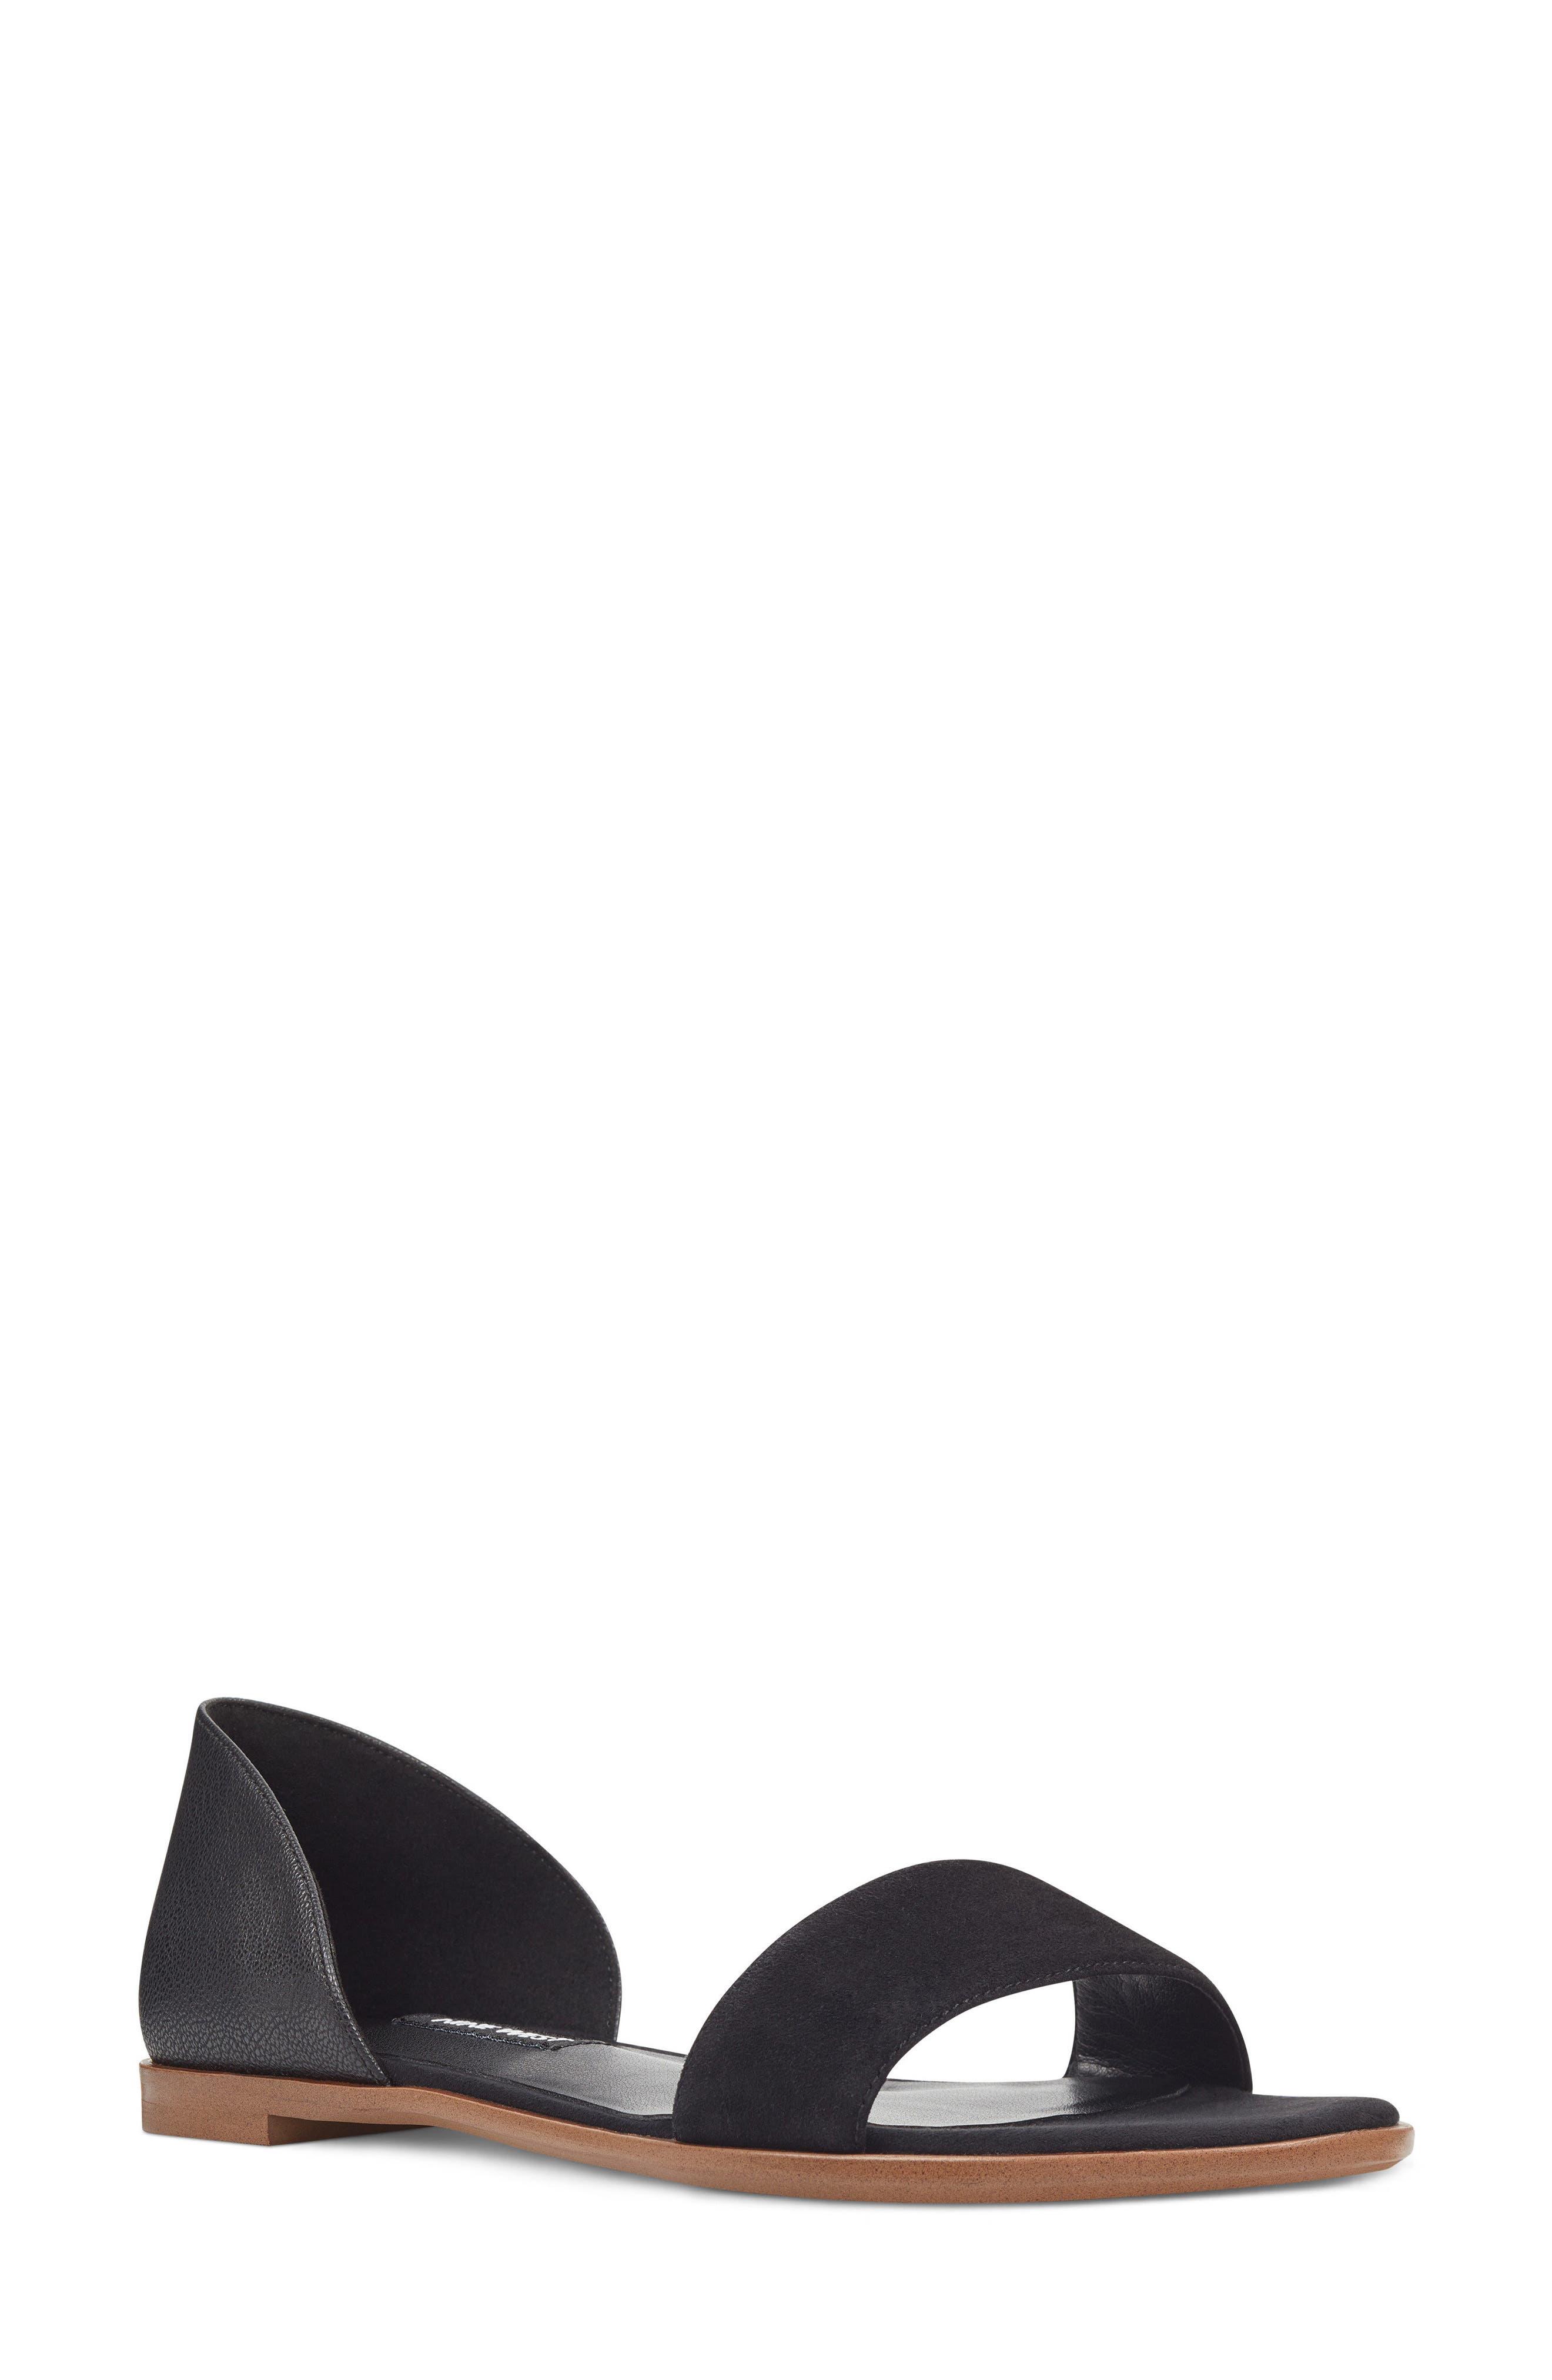 Maris Sandal,                         Main,                         color, Black/ Black Leather